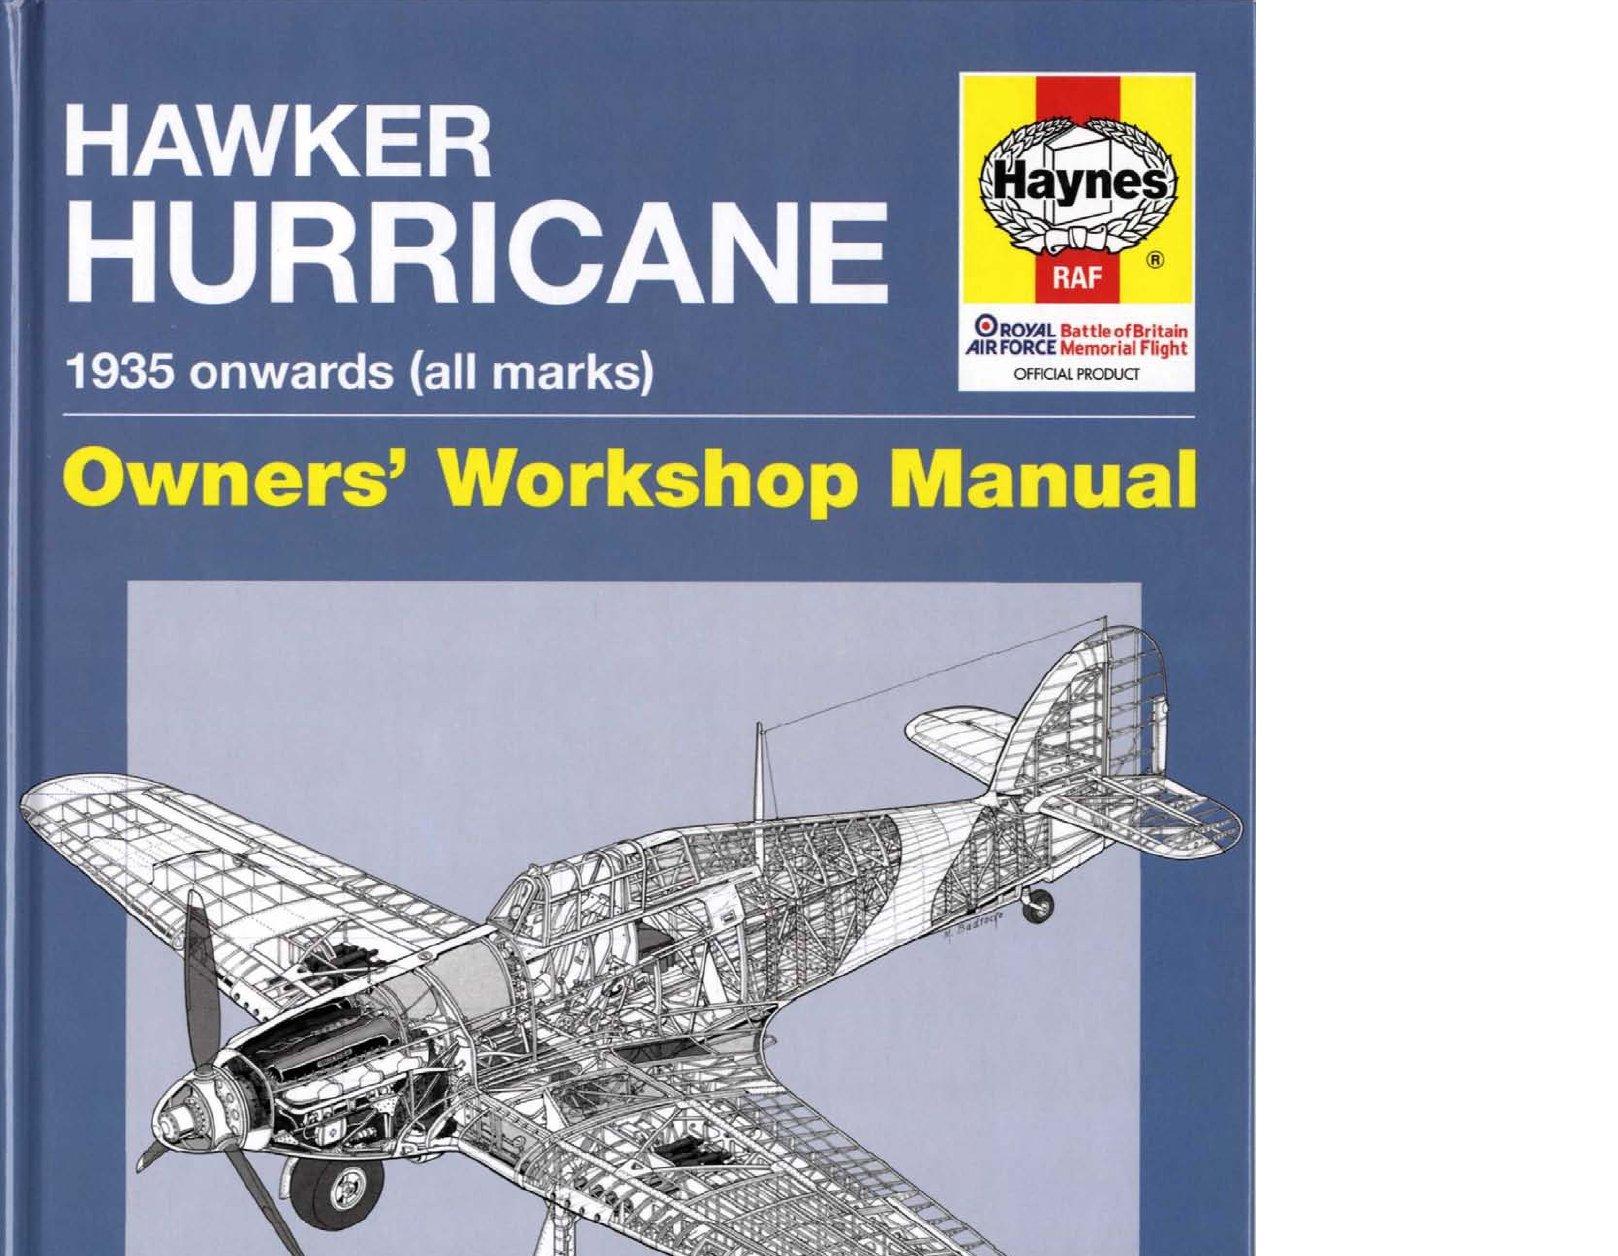 Hawker Hurricane 1935 onwards (all marks) / Хоукер Харрикейн 1935 года